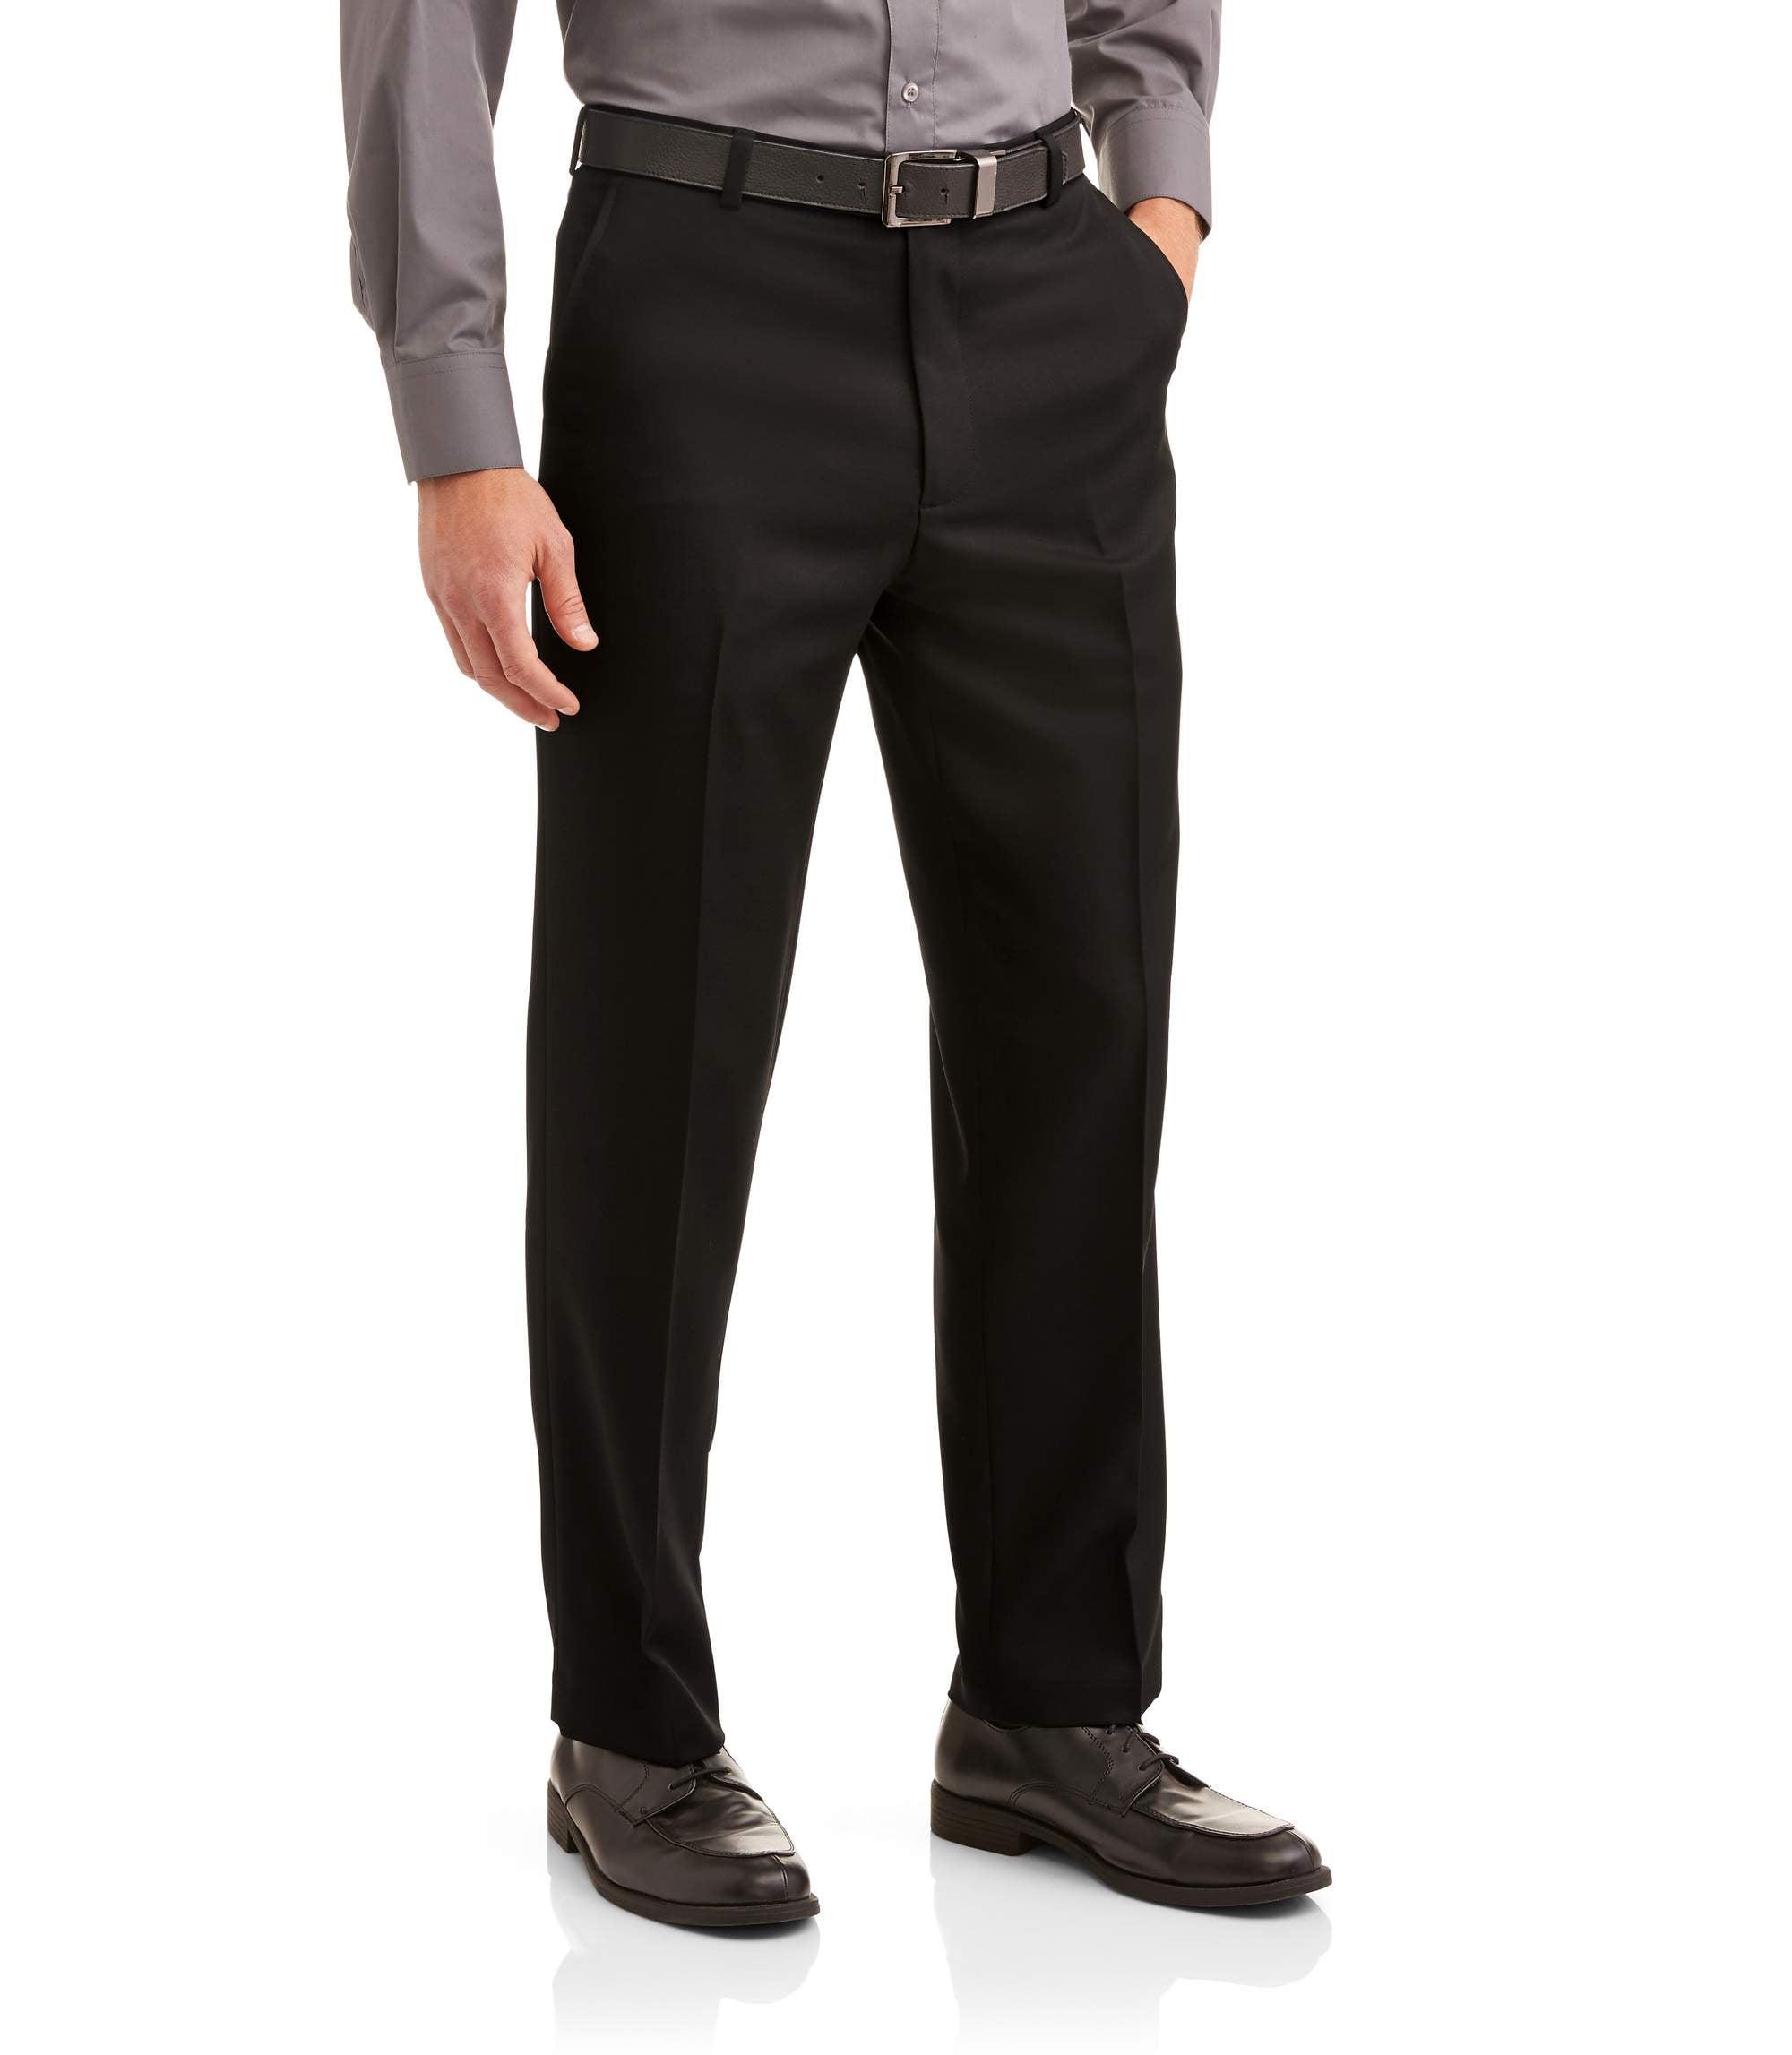 1d896ba6133 George - George Men's Microfiber Performance Flat Front Dress Pant -  Walmart.com